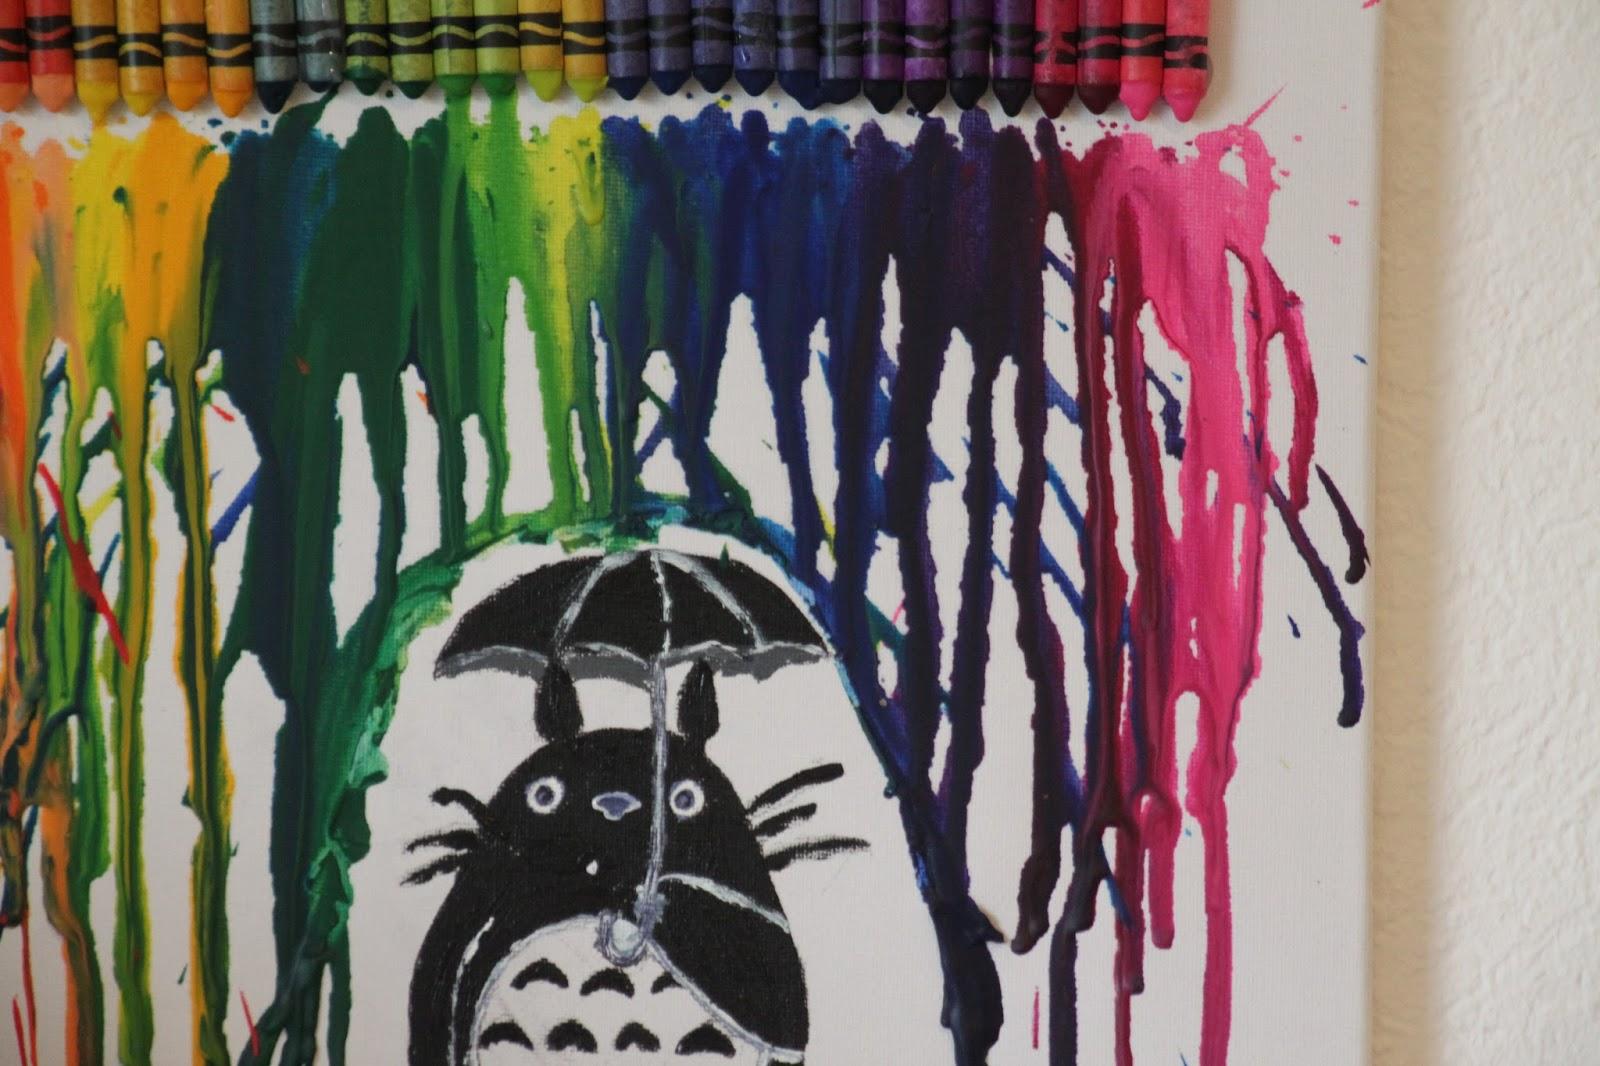 Students Little Kitchen Melted Crayon Art Totoro